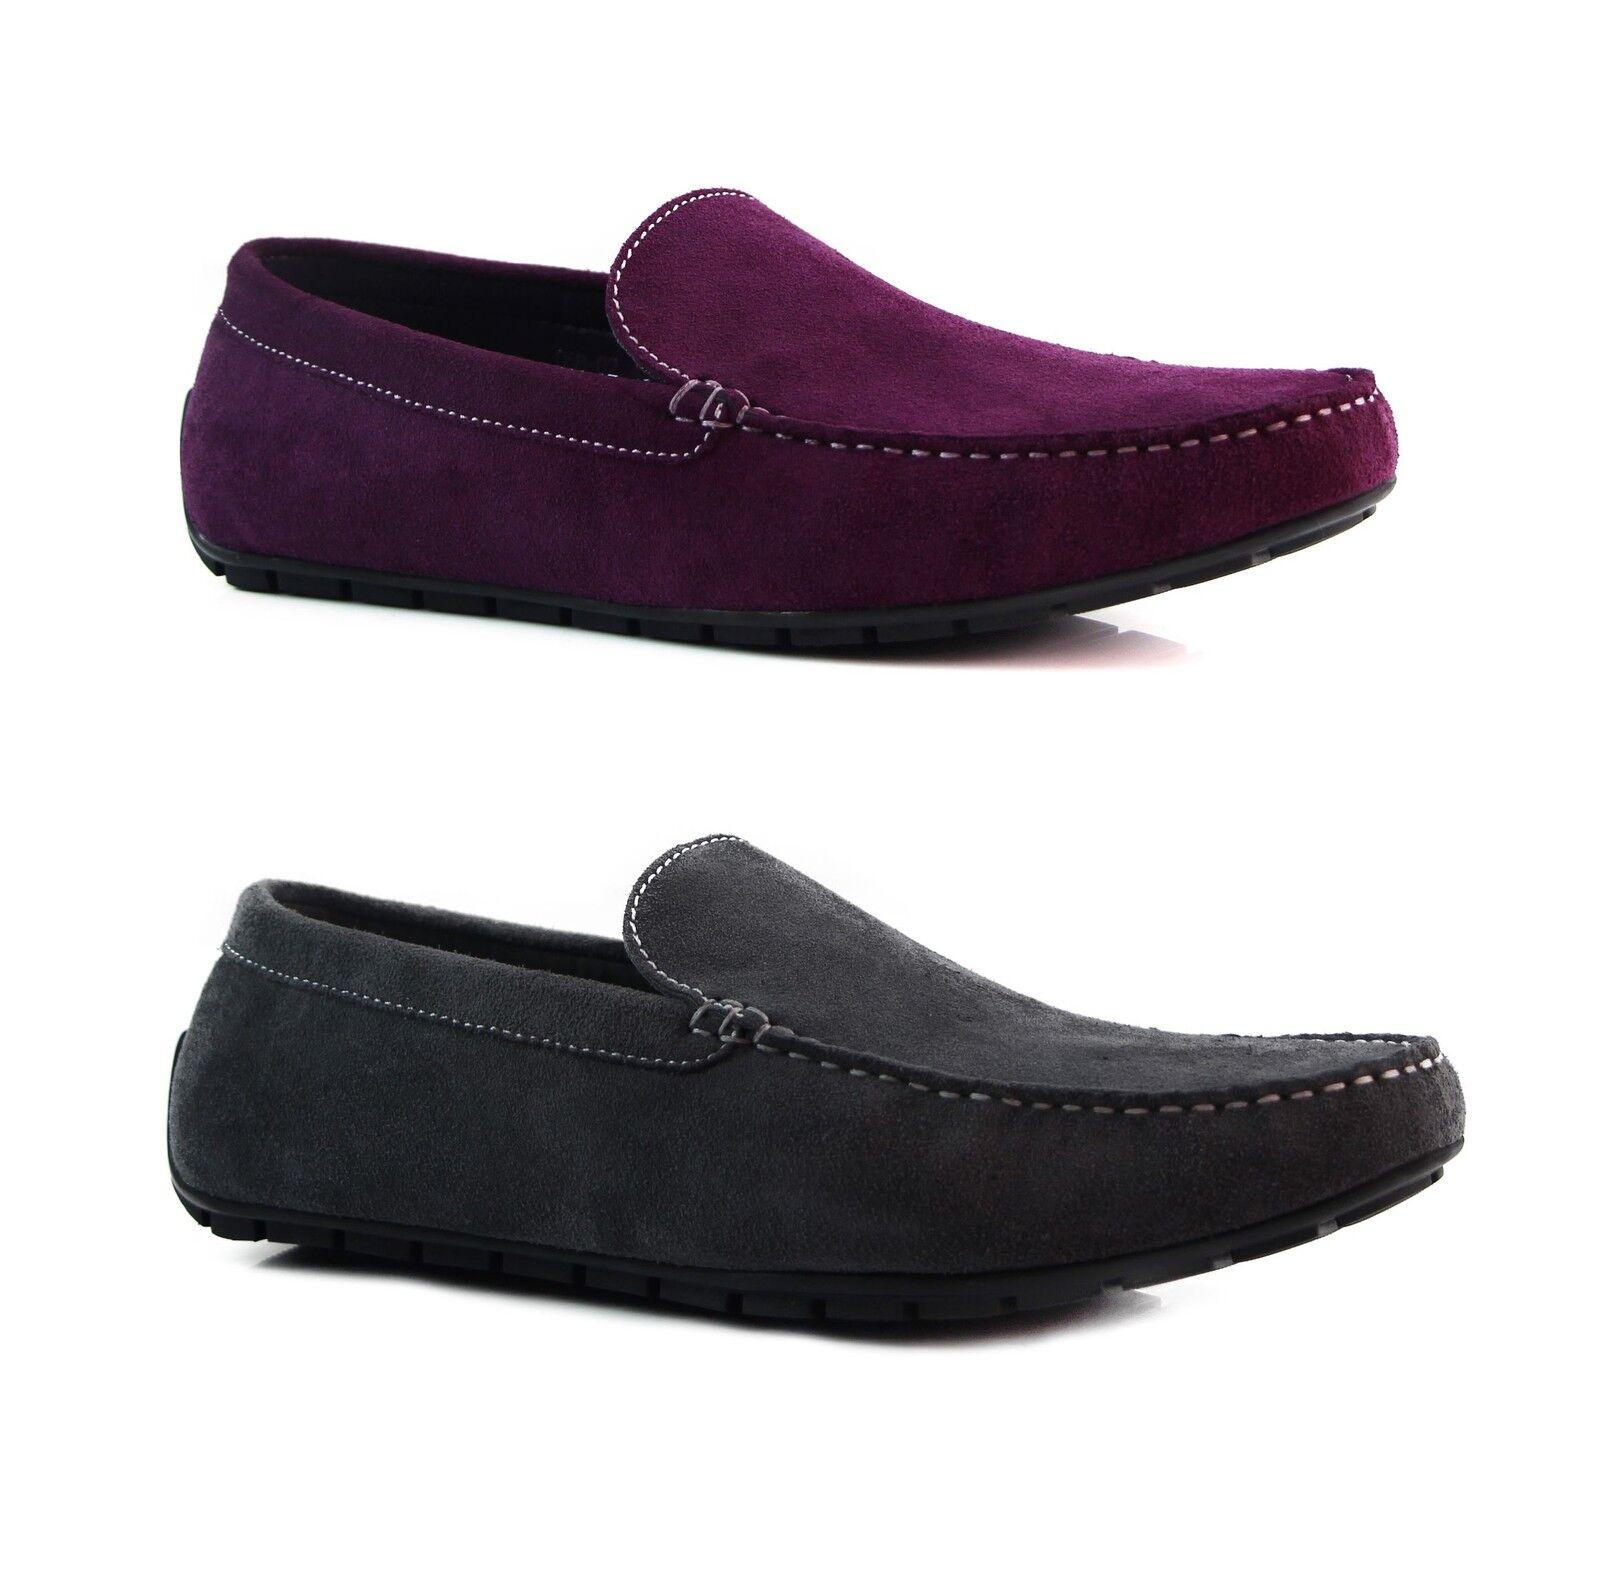 DARK GREY / PURPLE ZASEL  Herren SUEDE LEATHER CASUAL Schuhe PLAIN BOAT DECK LOAFERS Schuhe CASUAL d2e7e7